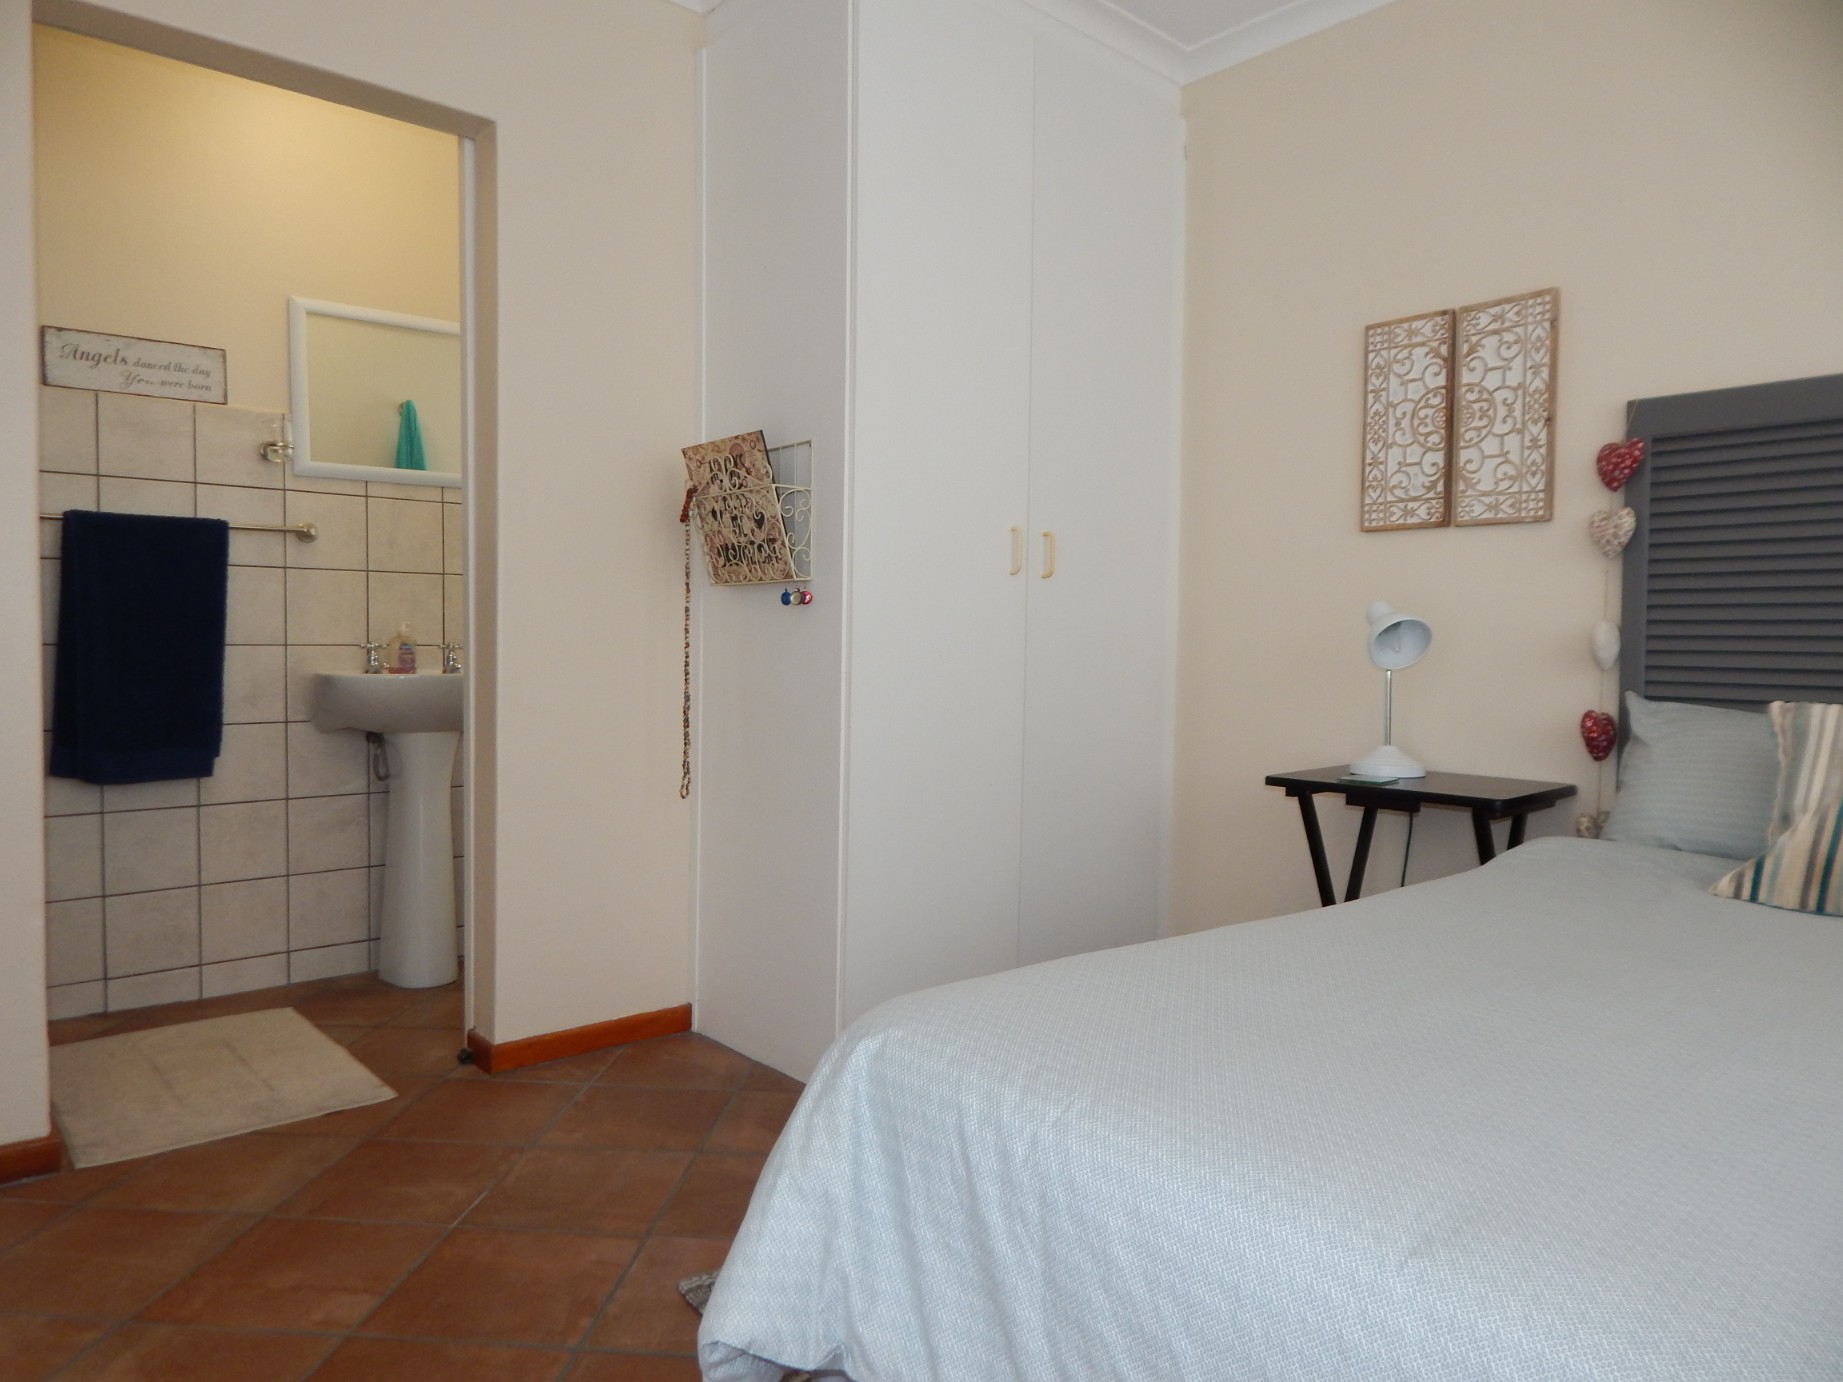 3 Bedroom Apartment for sale in De Bakke ENT0066483 : photo#15